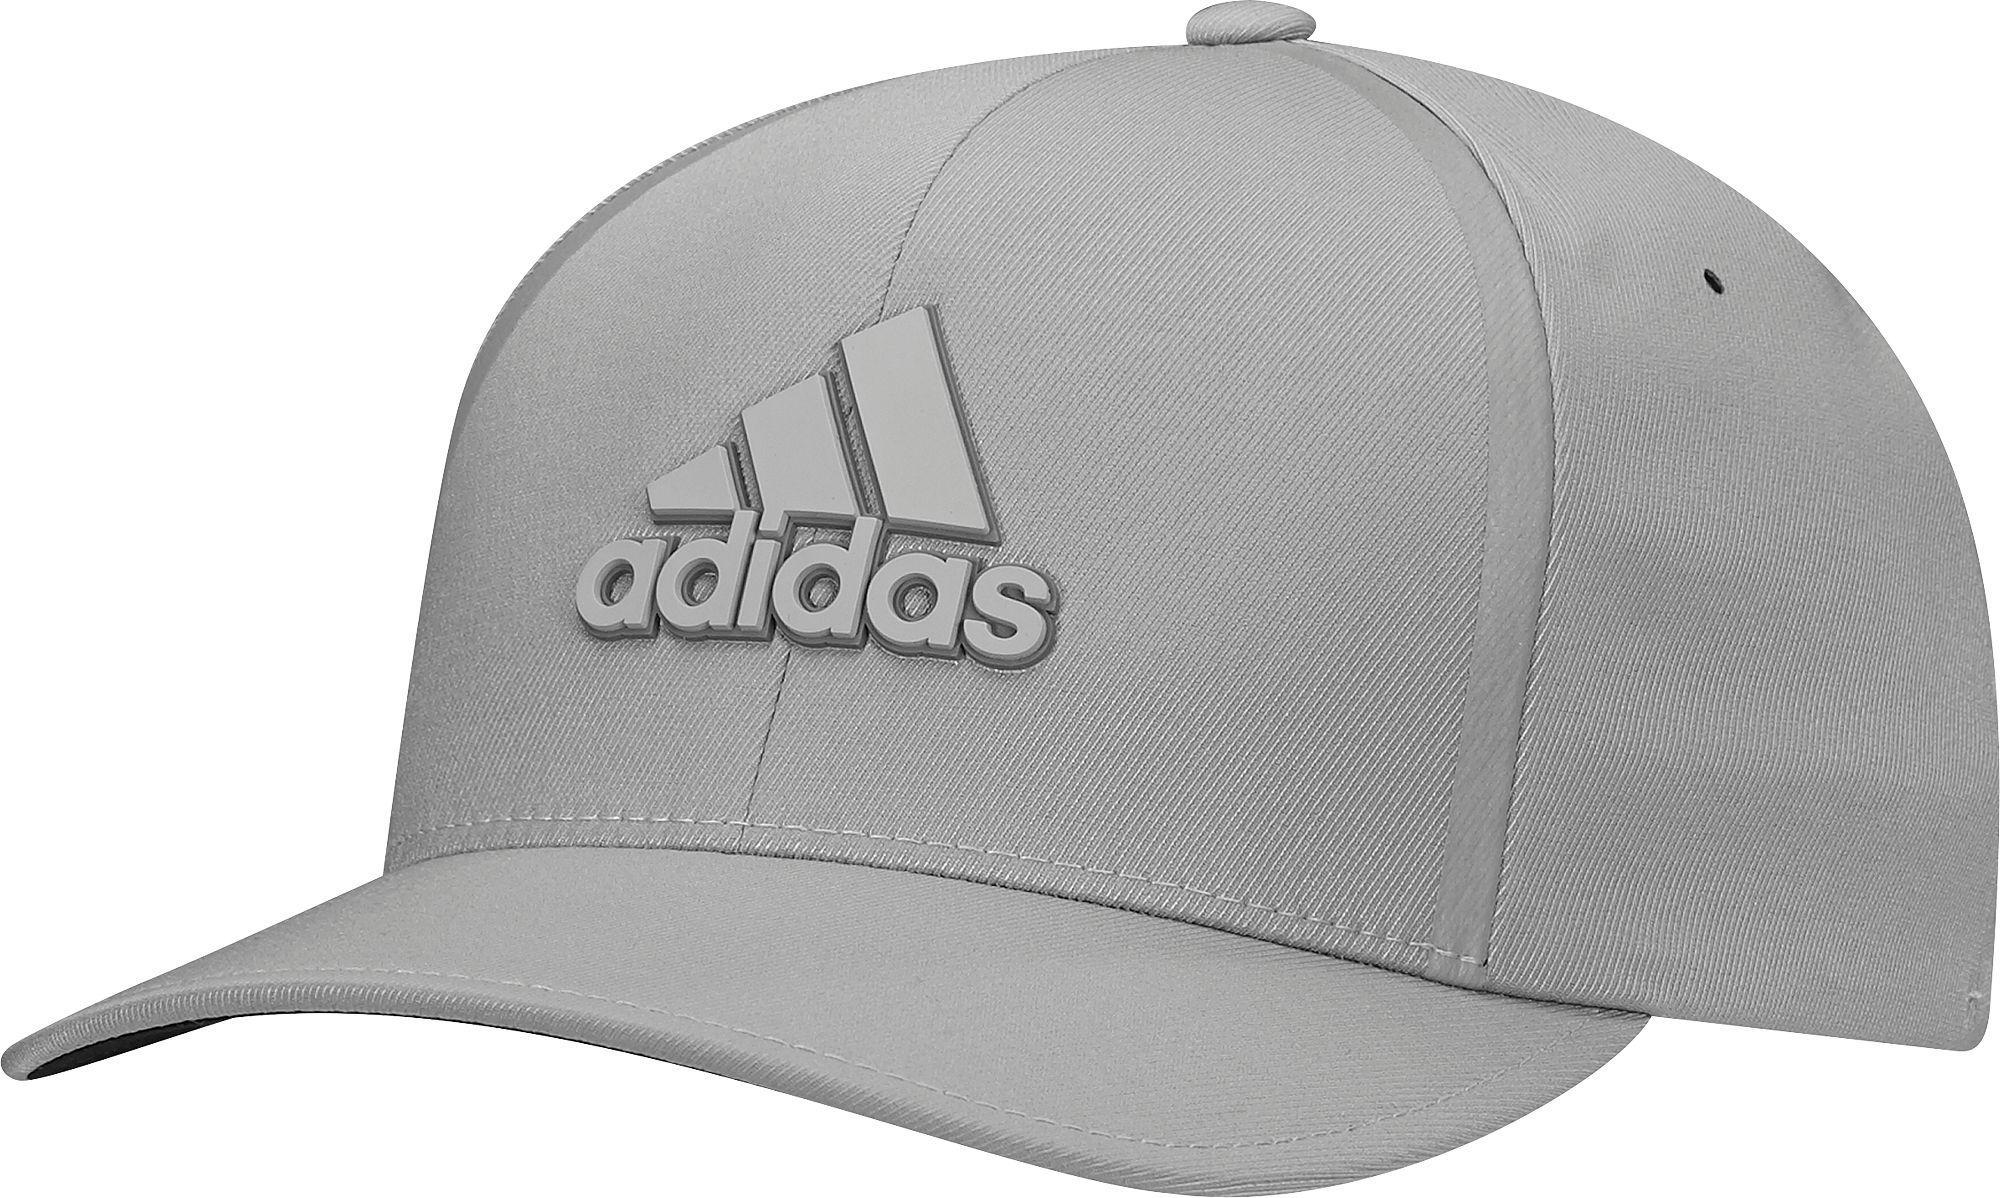 2ad4464de88 Lyst - Adidas Tour Delta Textured Golf Hat in Gray for Men